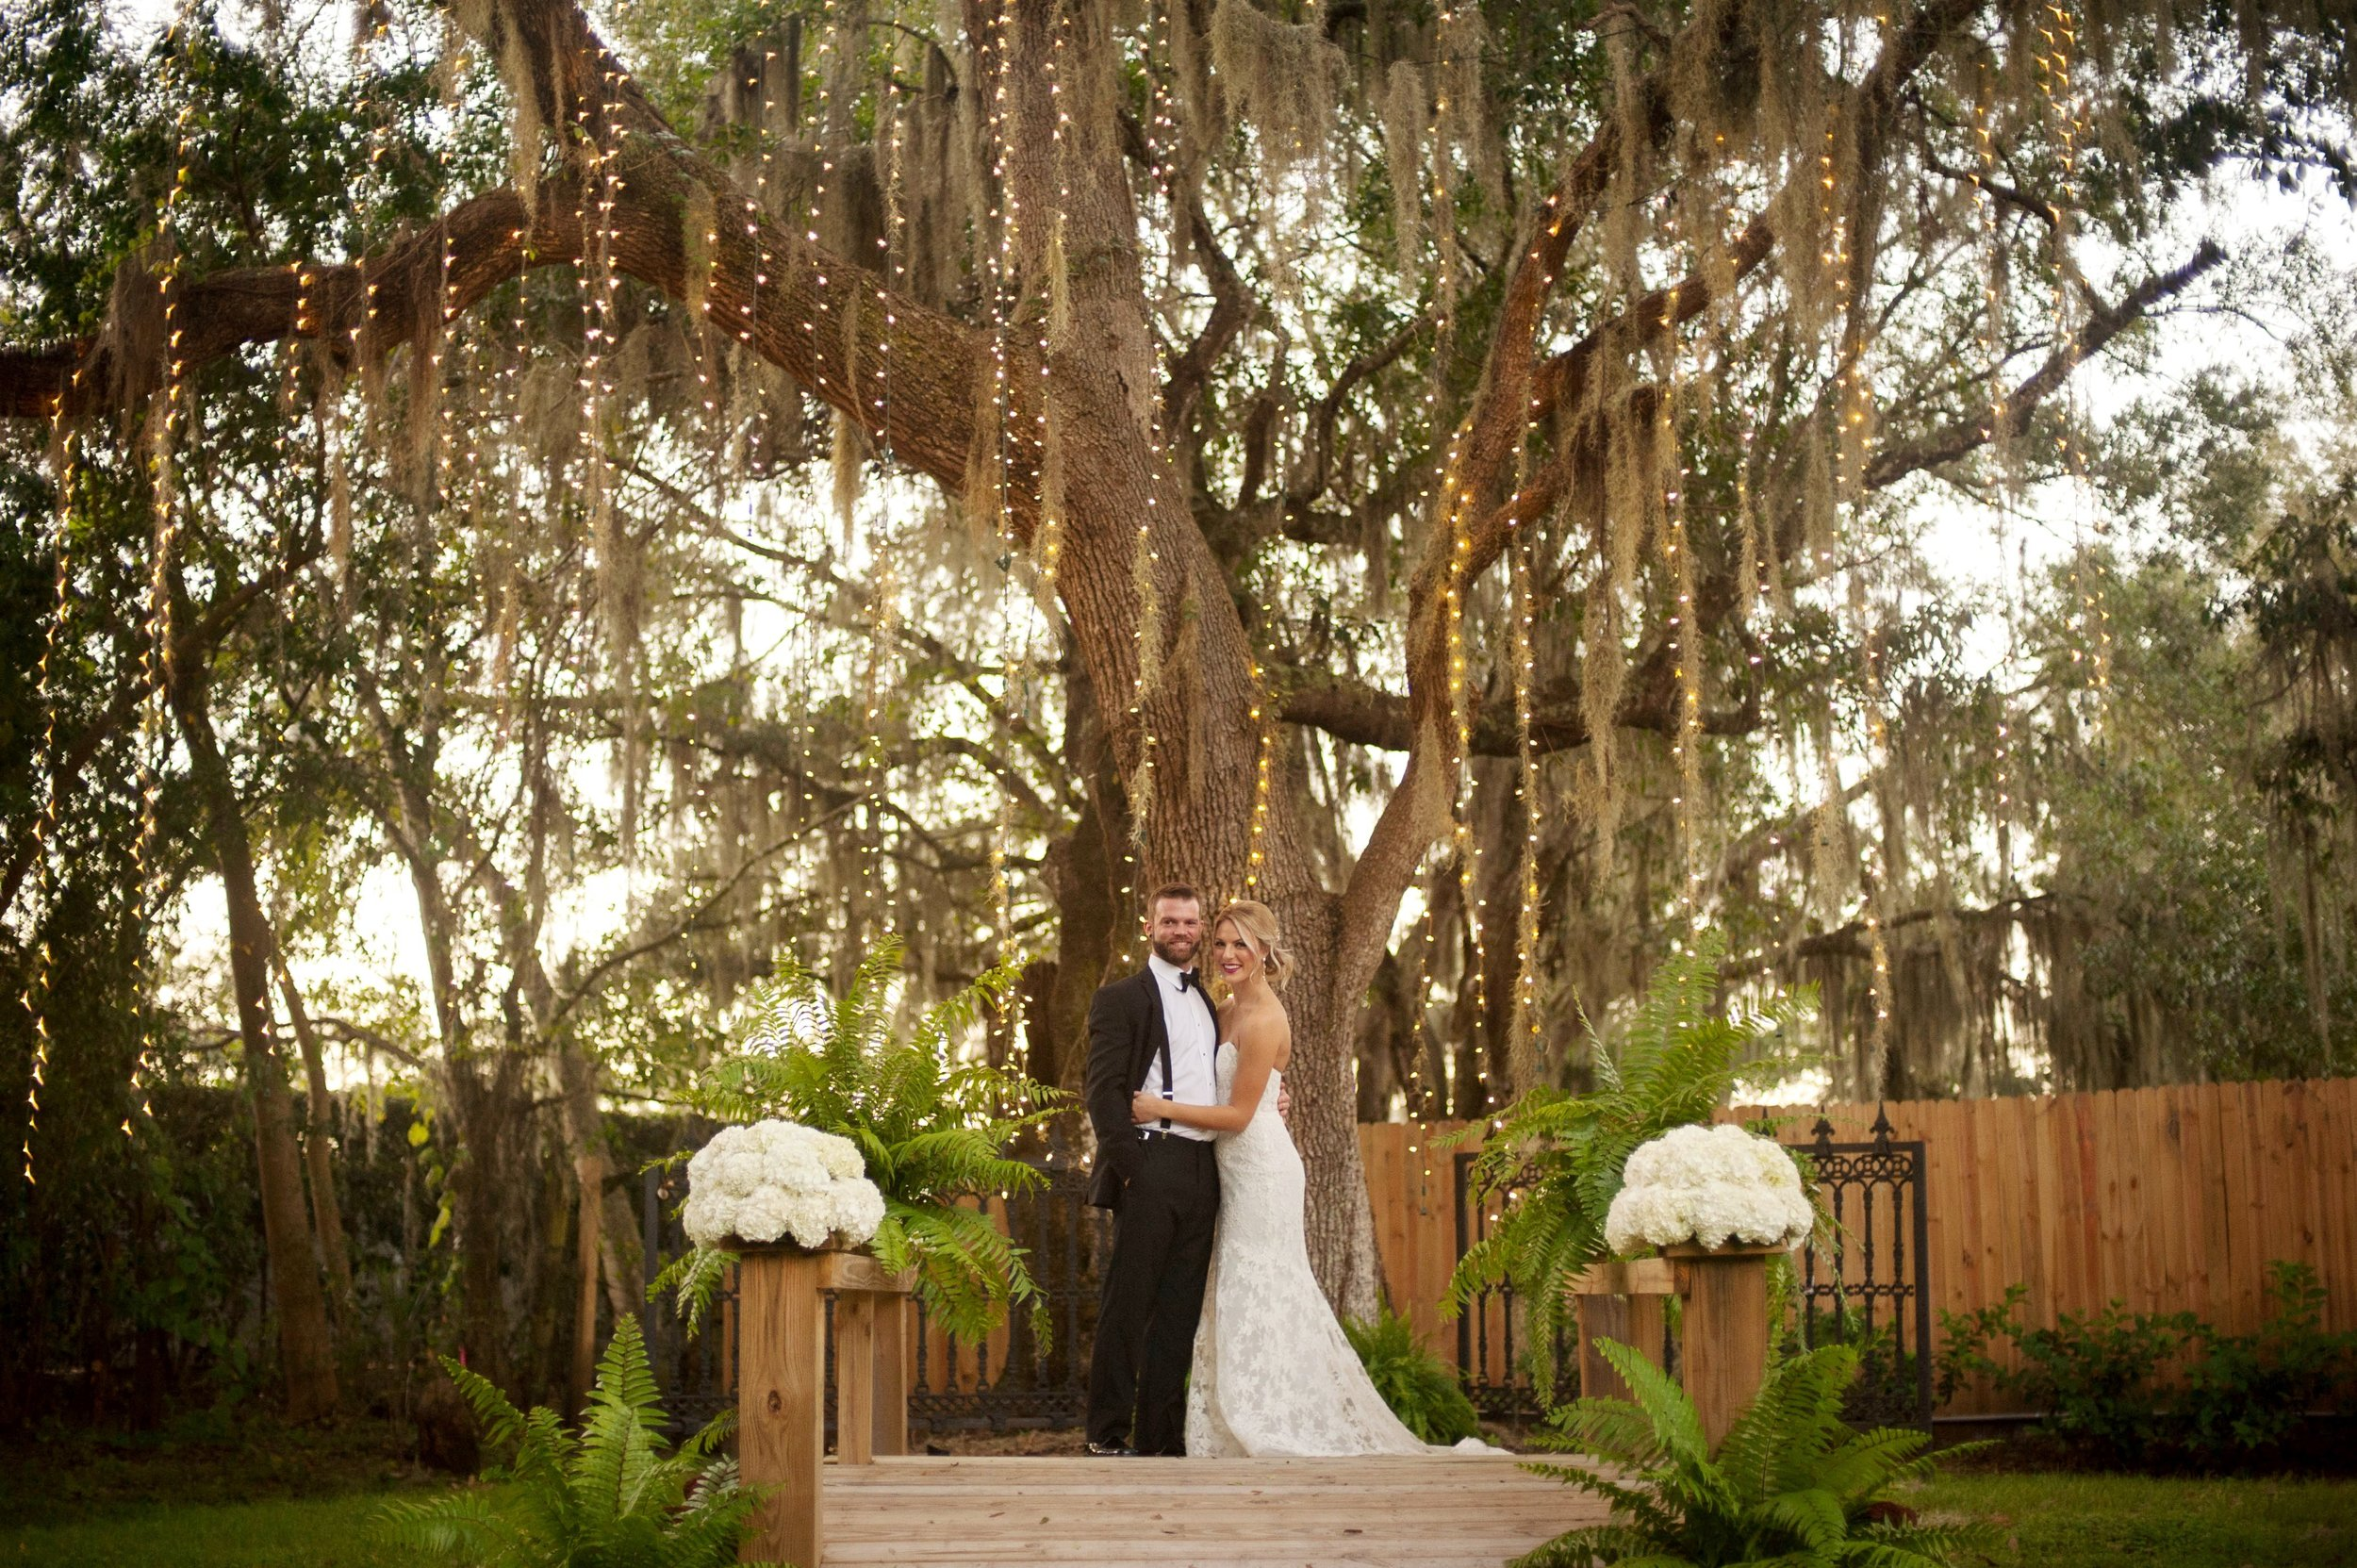 Bakers ranch - Wedding Venue - Love Lock Bridge.jpg